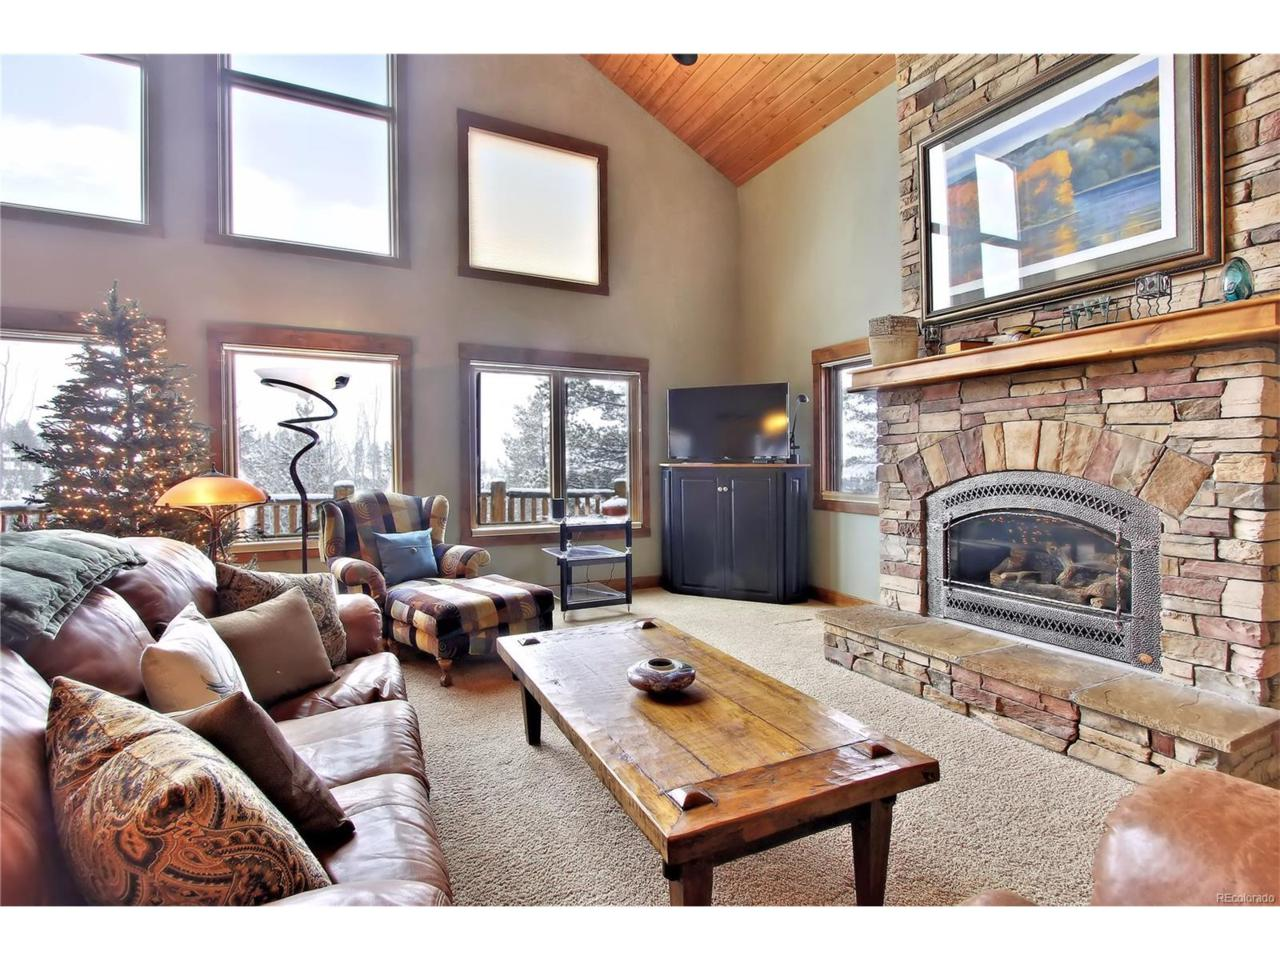 762 County Road 8, Fraser, CO 80442 (MLS #2557378) :: 8z Real Estate